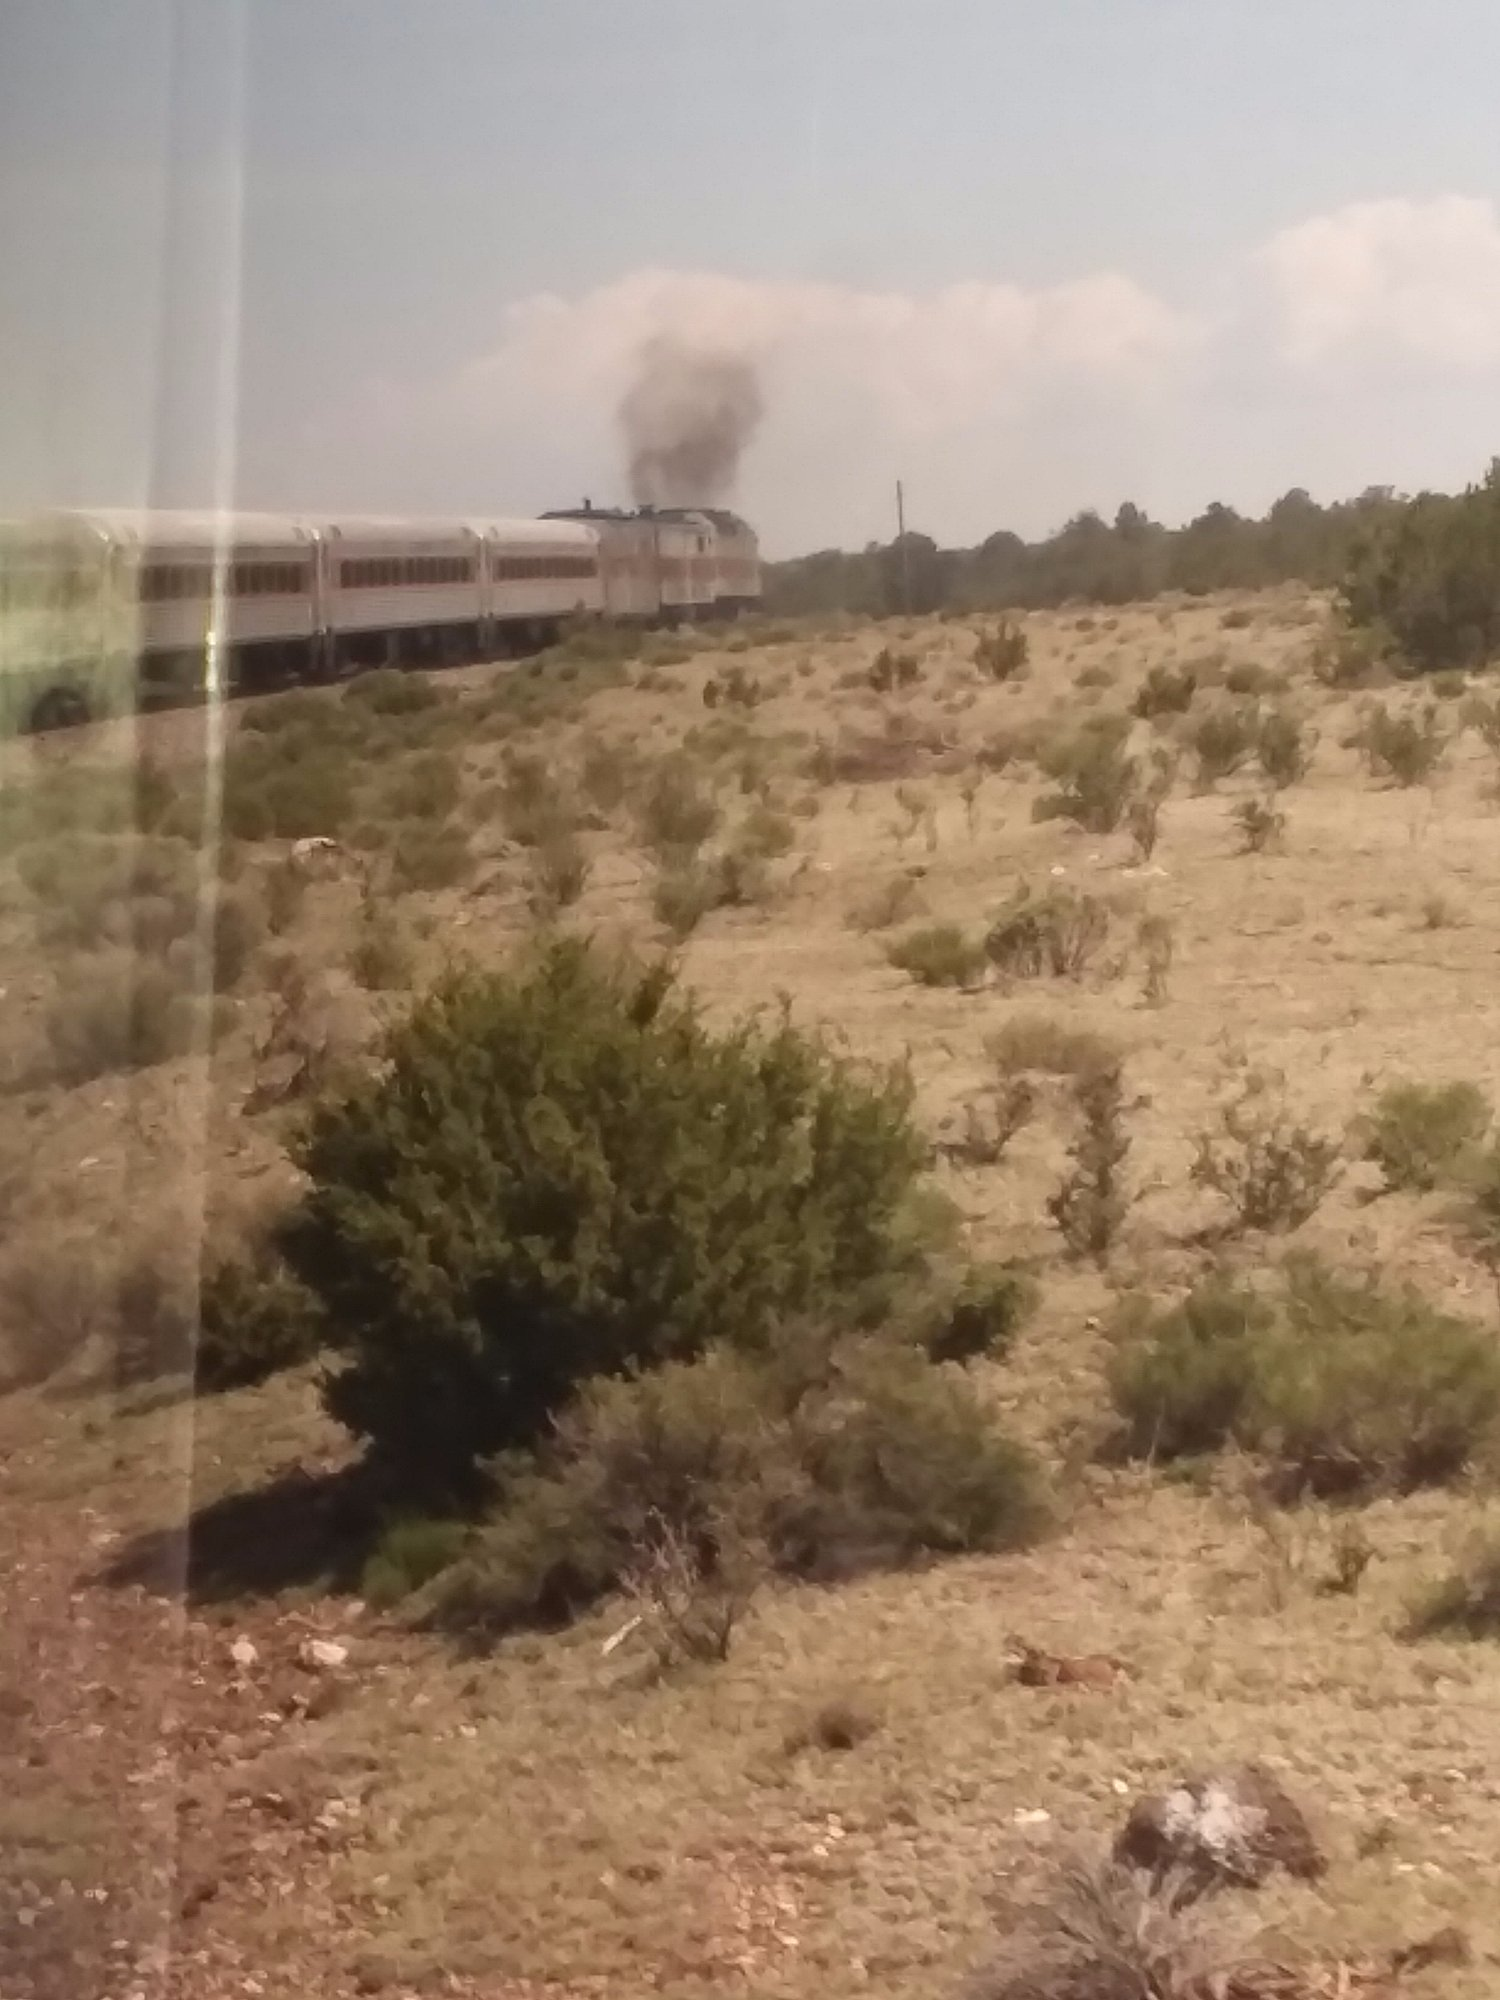 On the Grand Canyon Railway Train